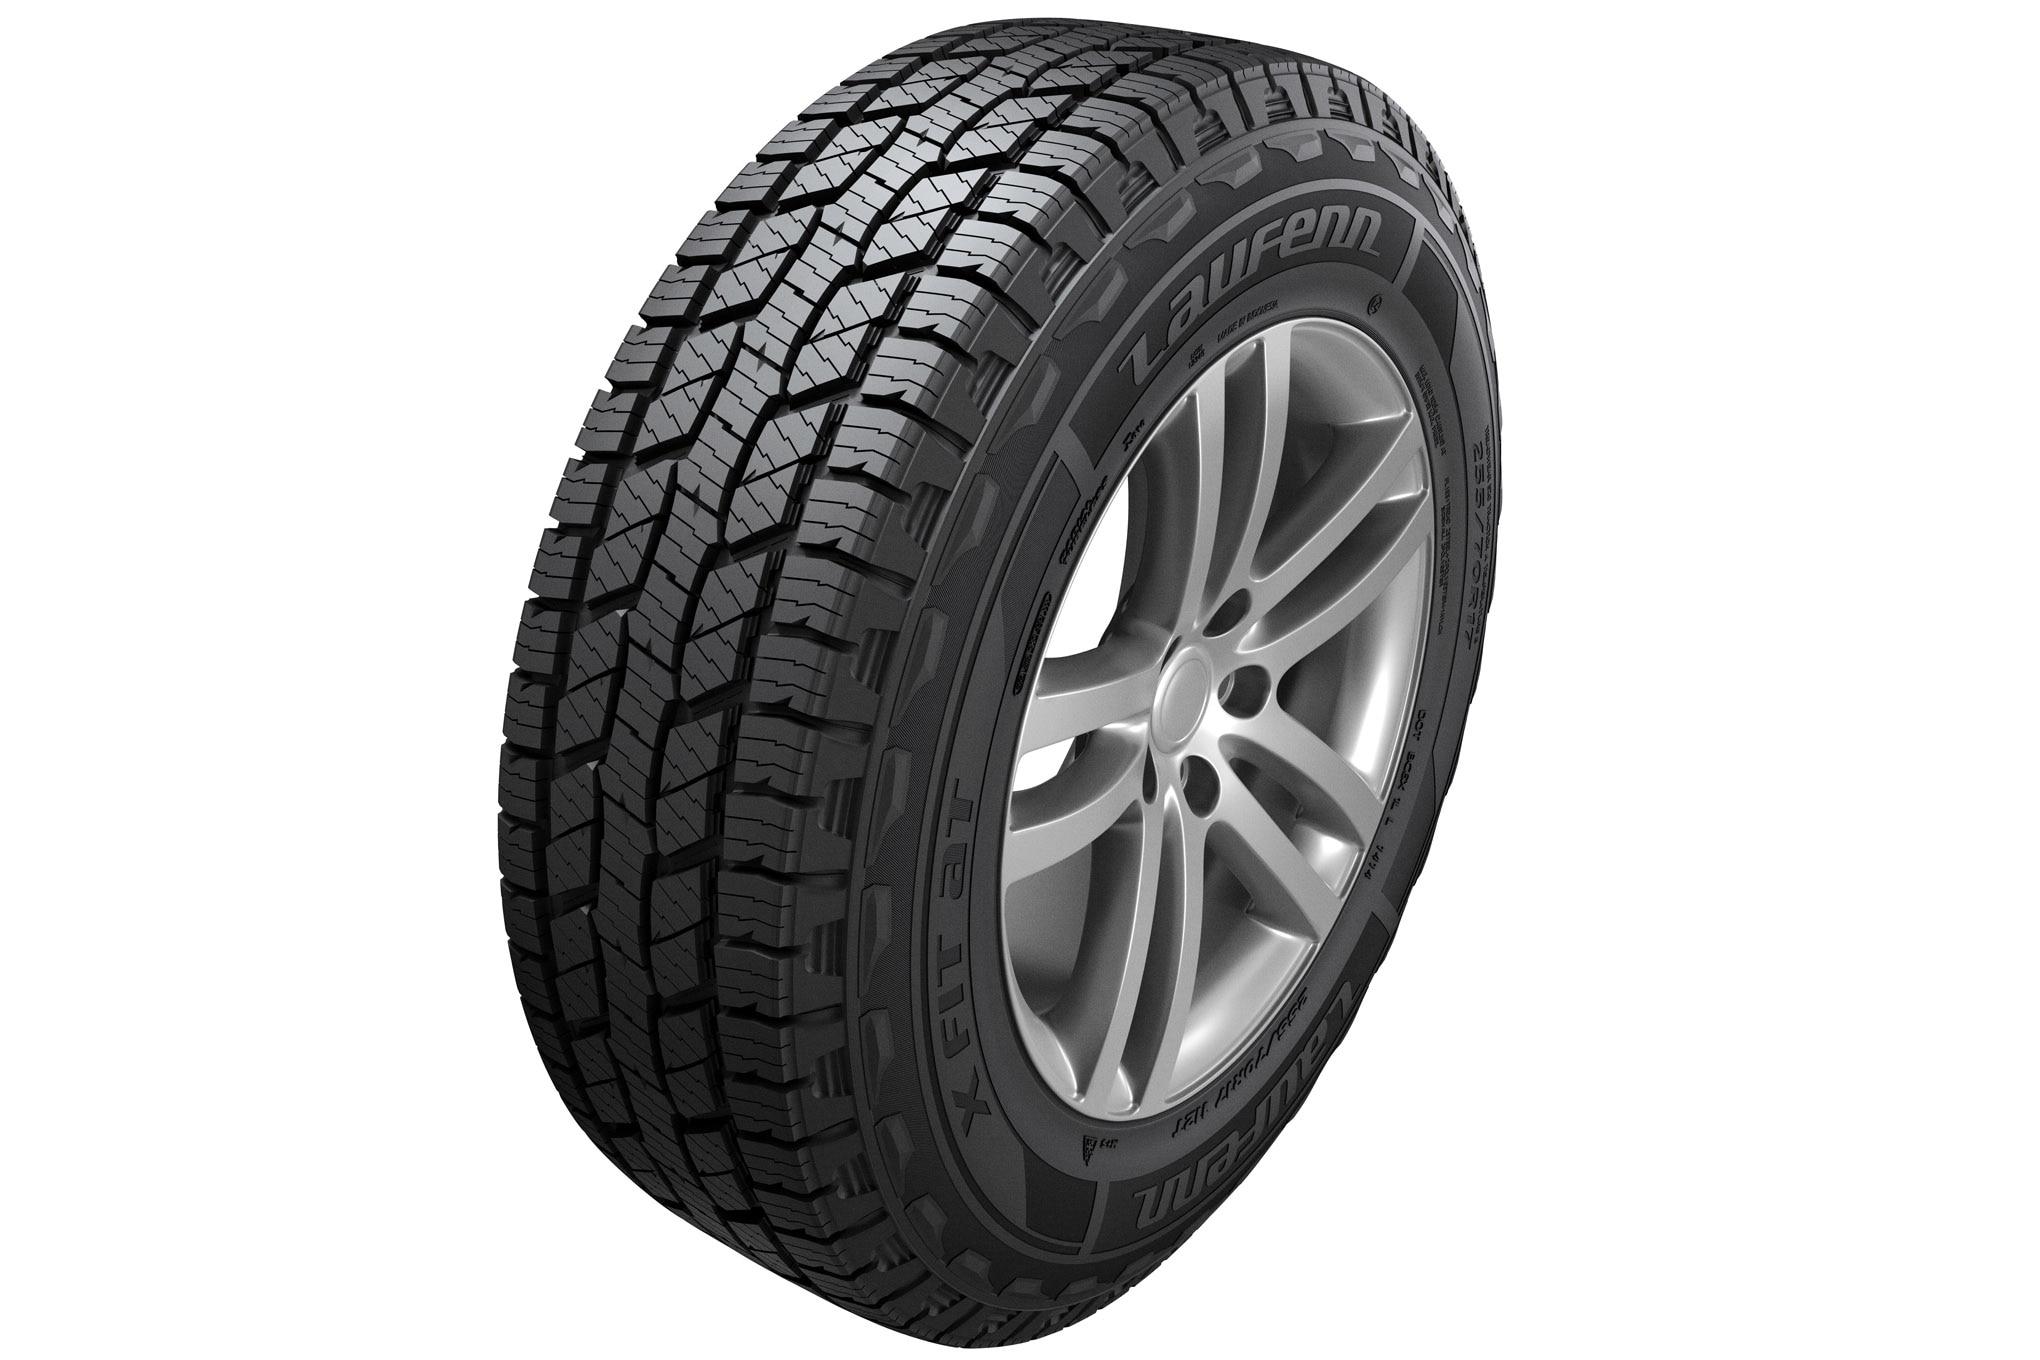 033 new tires laufenn x fit at